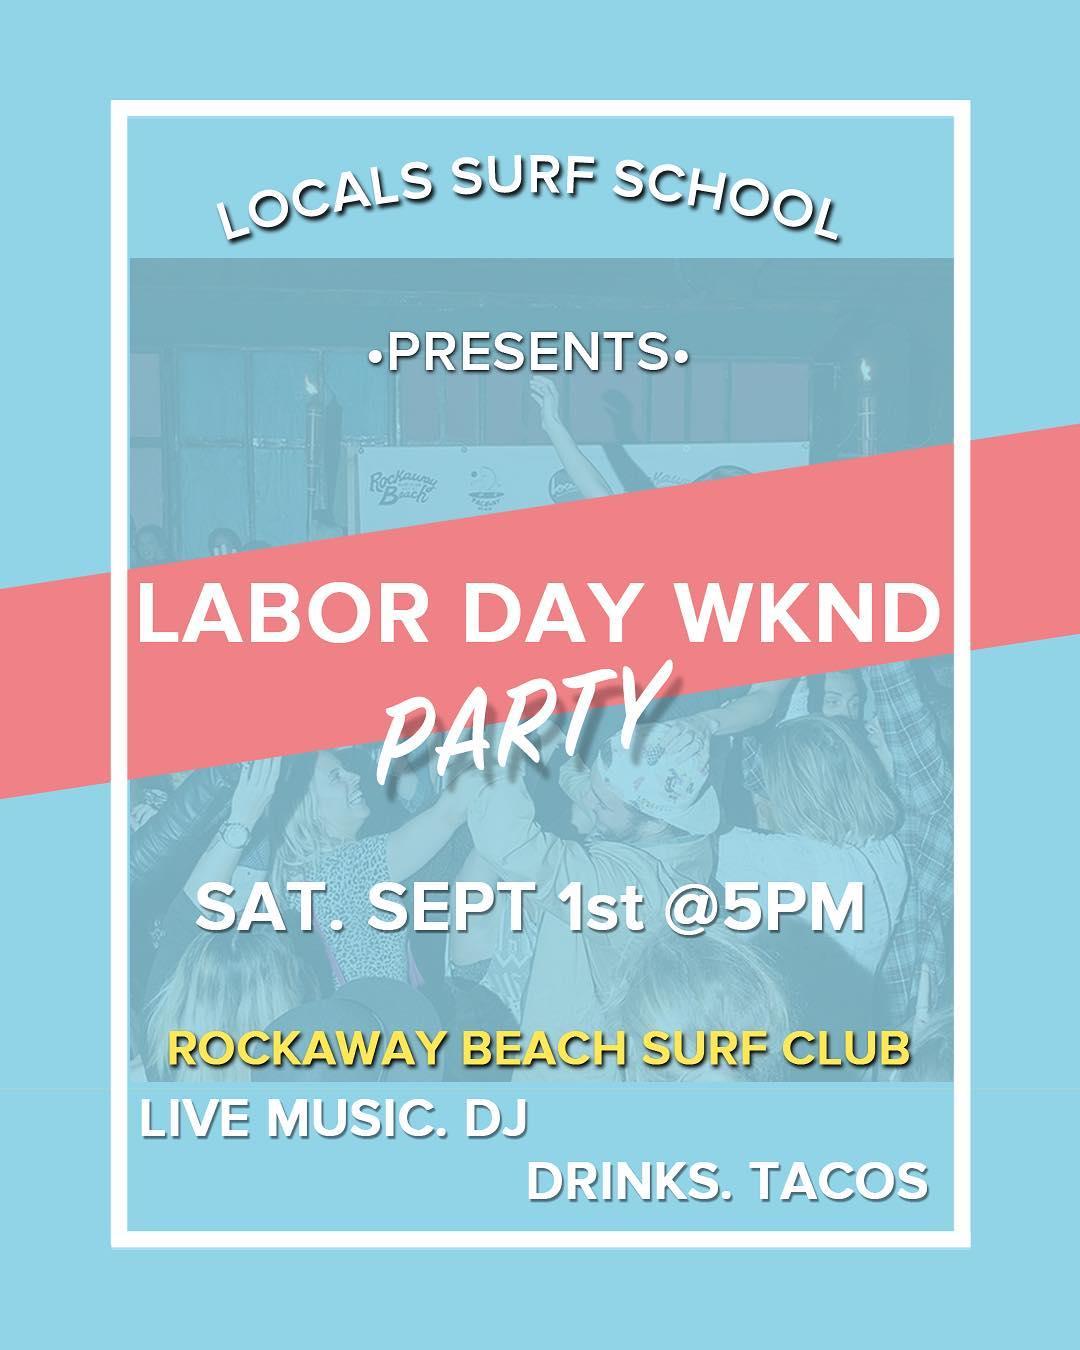 labor day weekend party locals surf school rockaway beach surf club